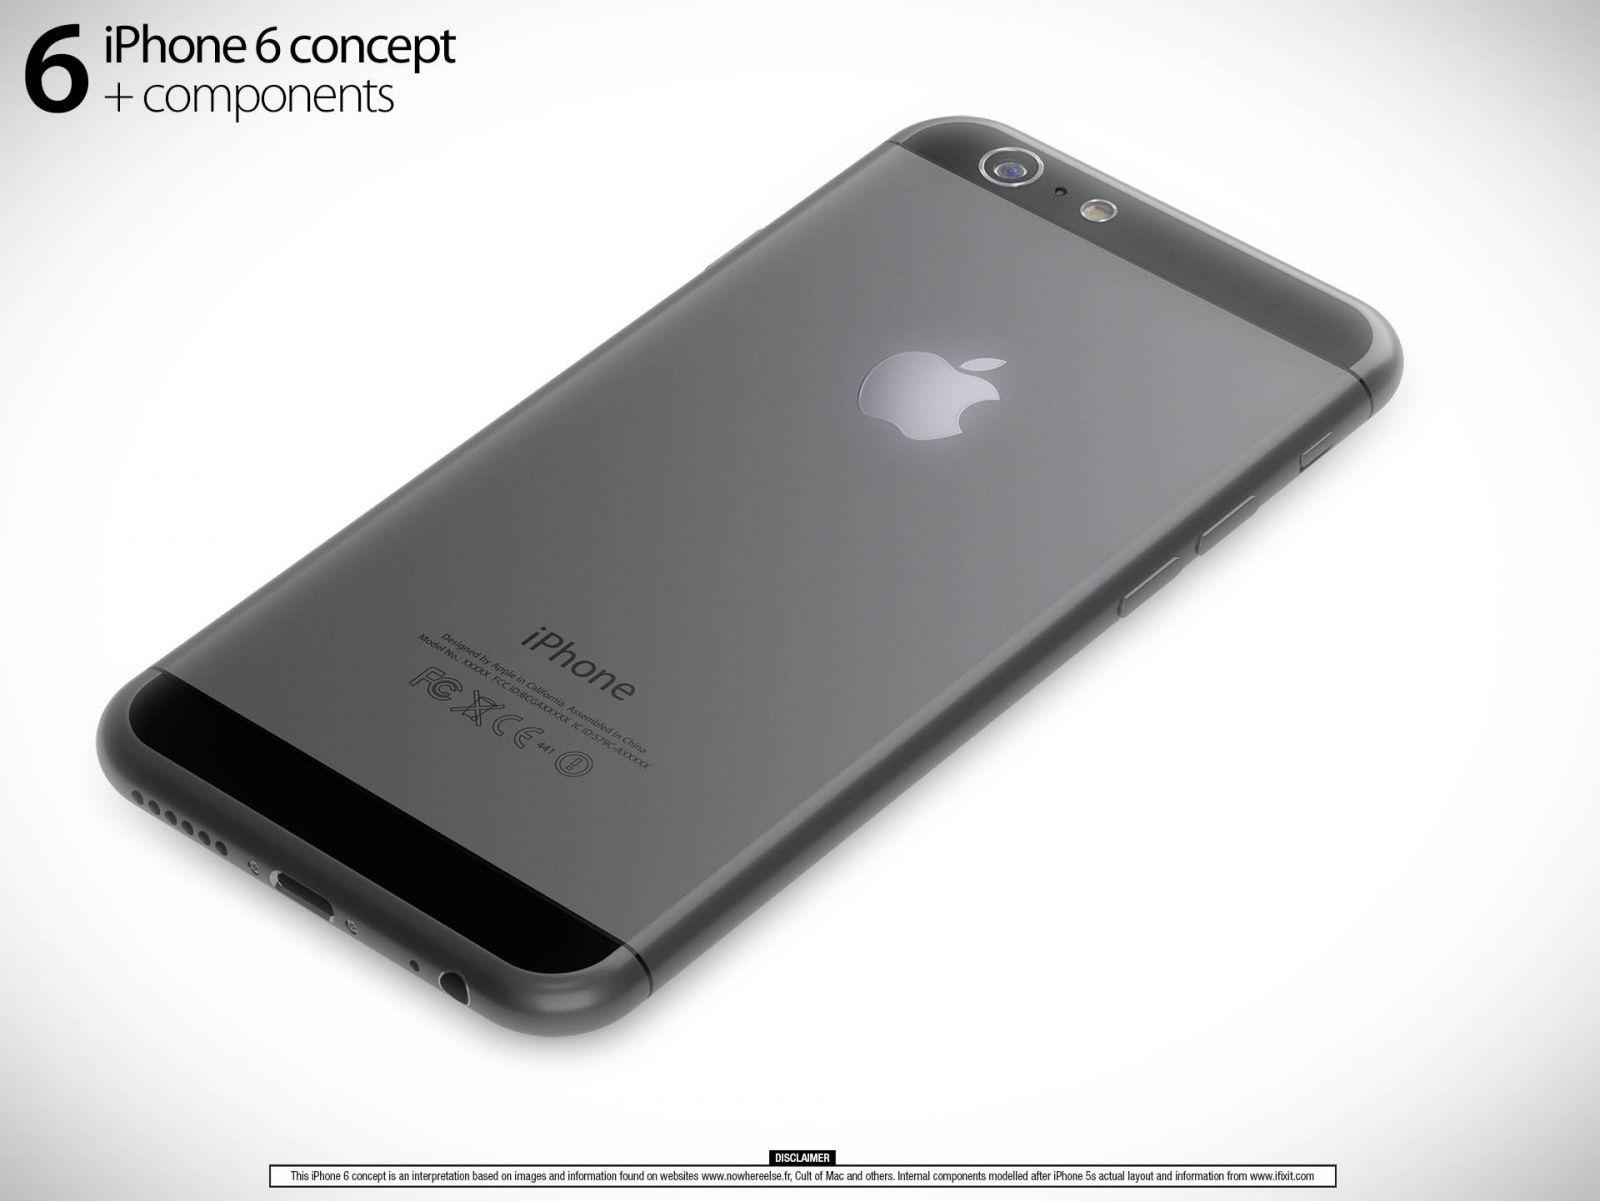 iphone6_martinhajek_12.jpg1a732dbc-c2b8-4fcf-8c93-91beb3983c60Original